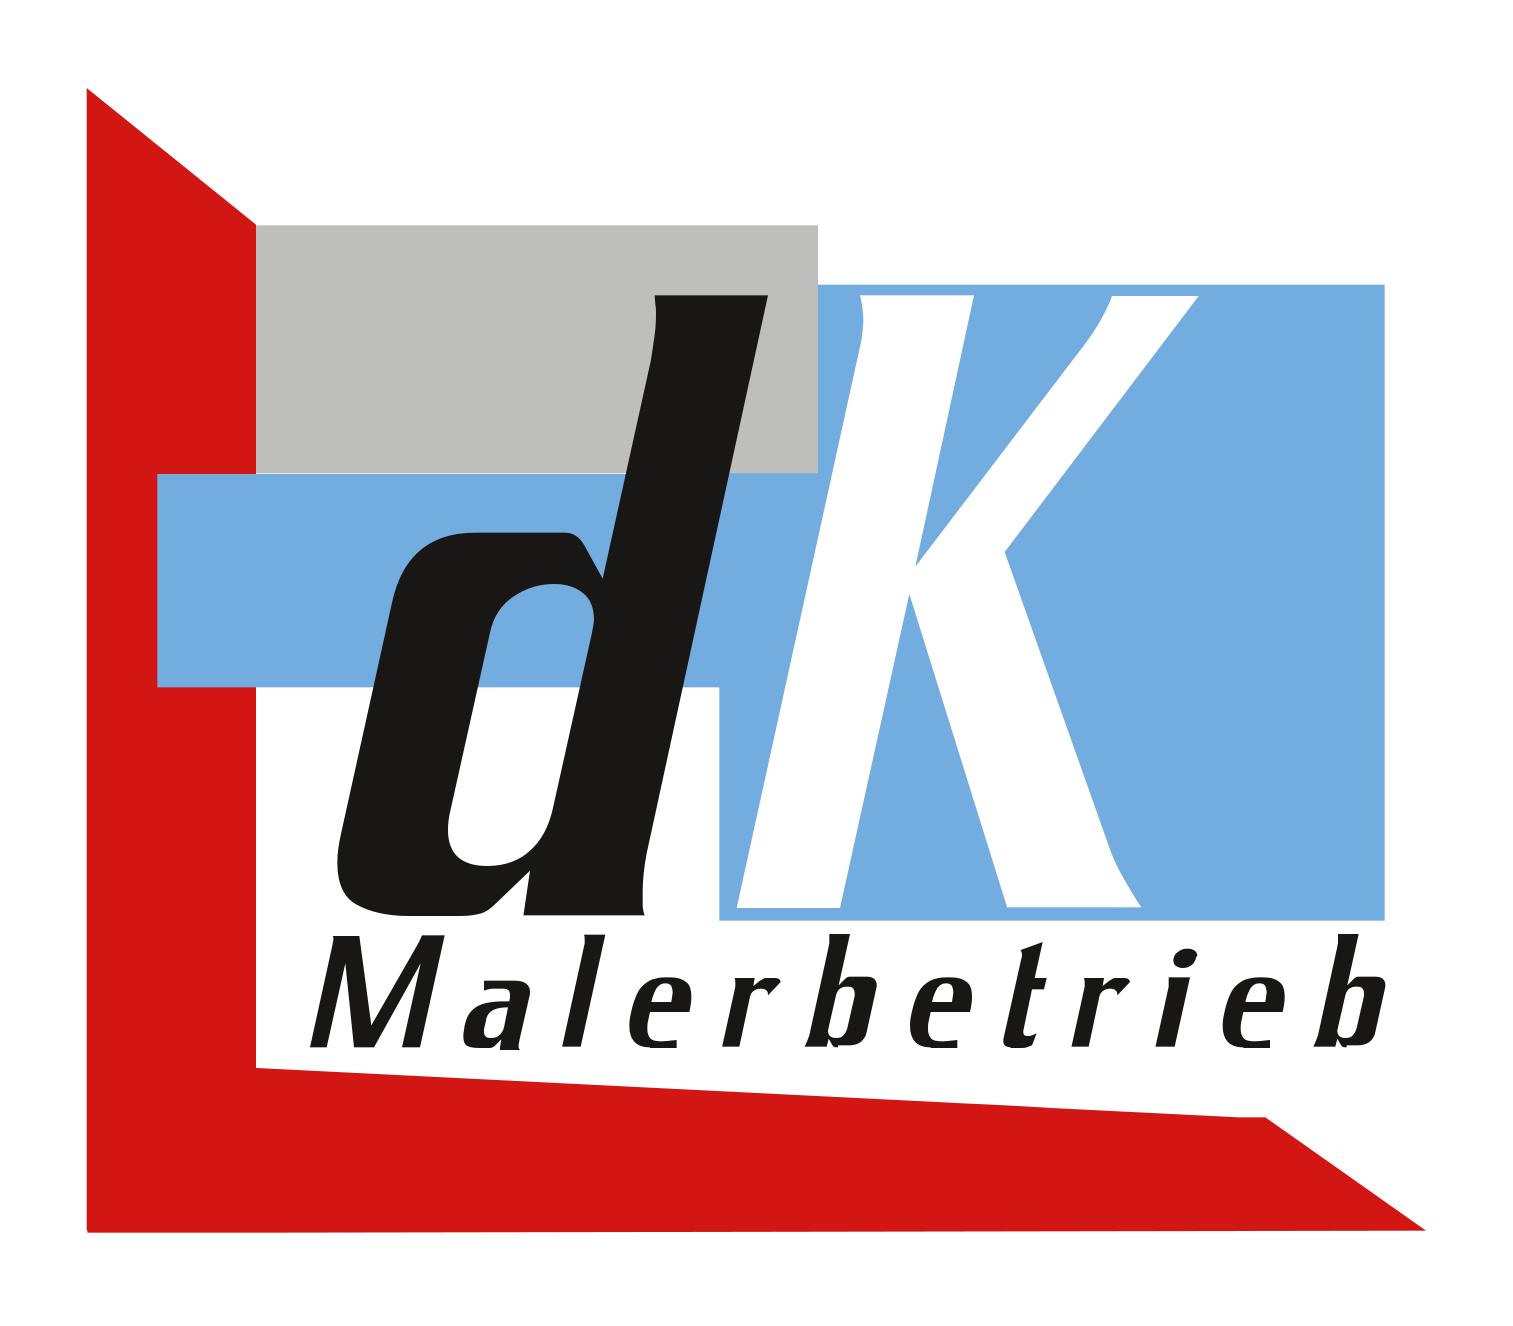 dK Malerbetrieb GmbH